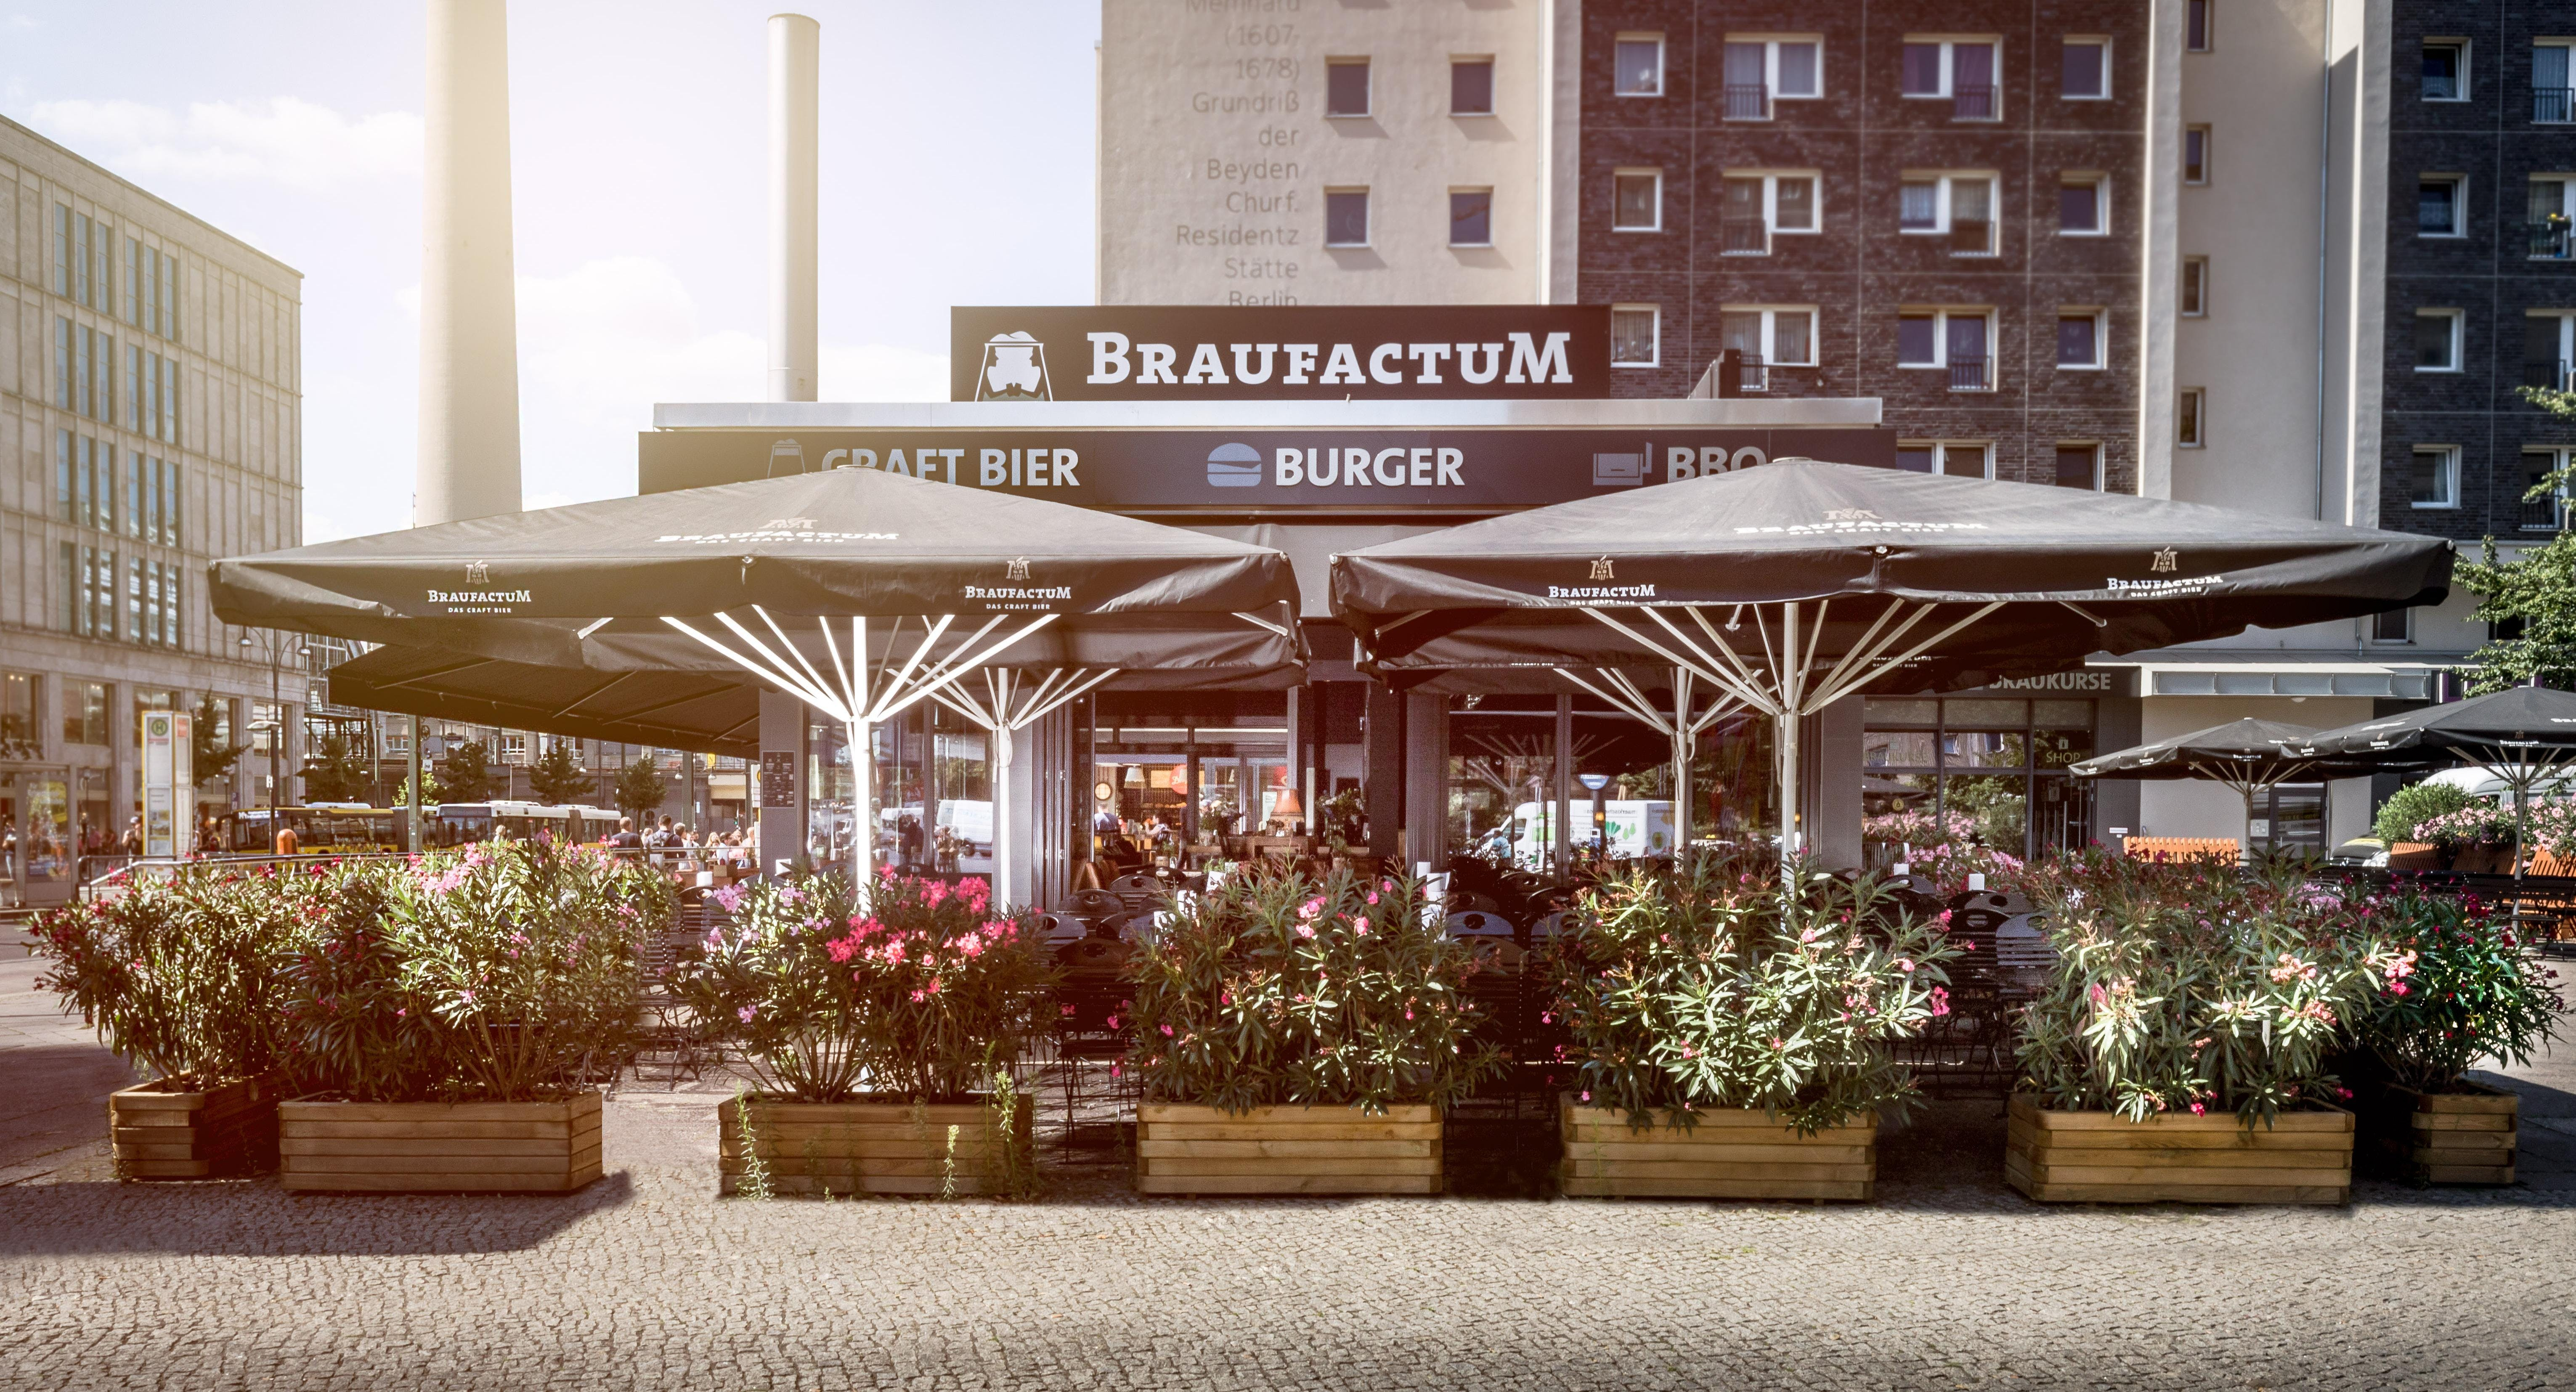 Braufactum Berlin Berlin image 1